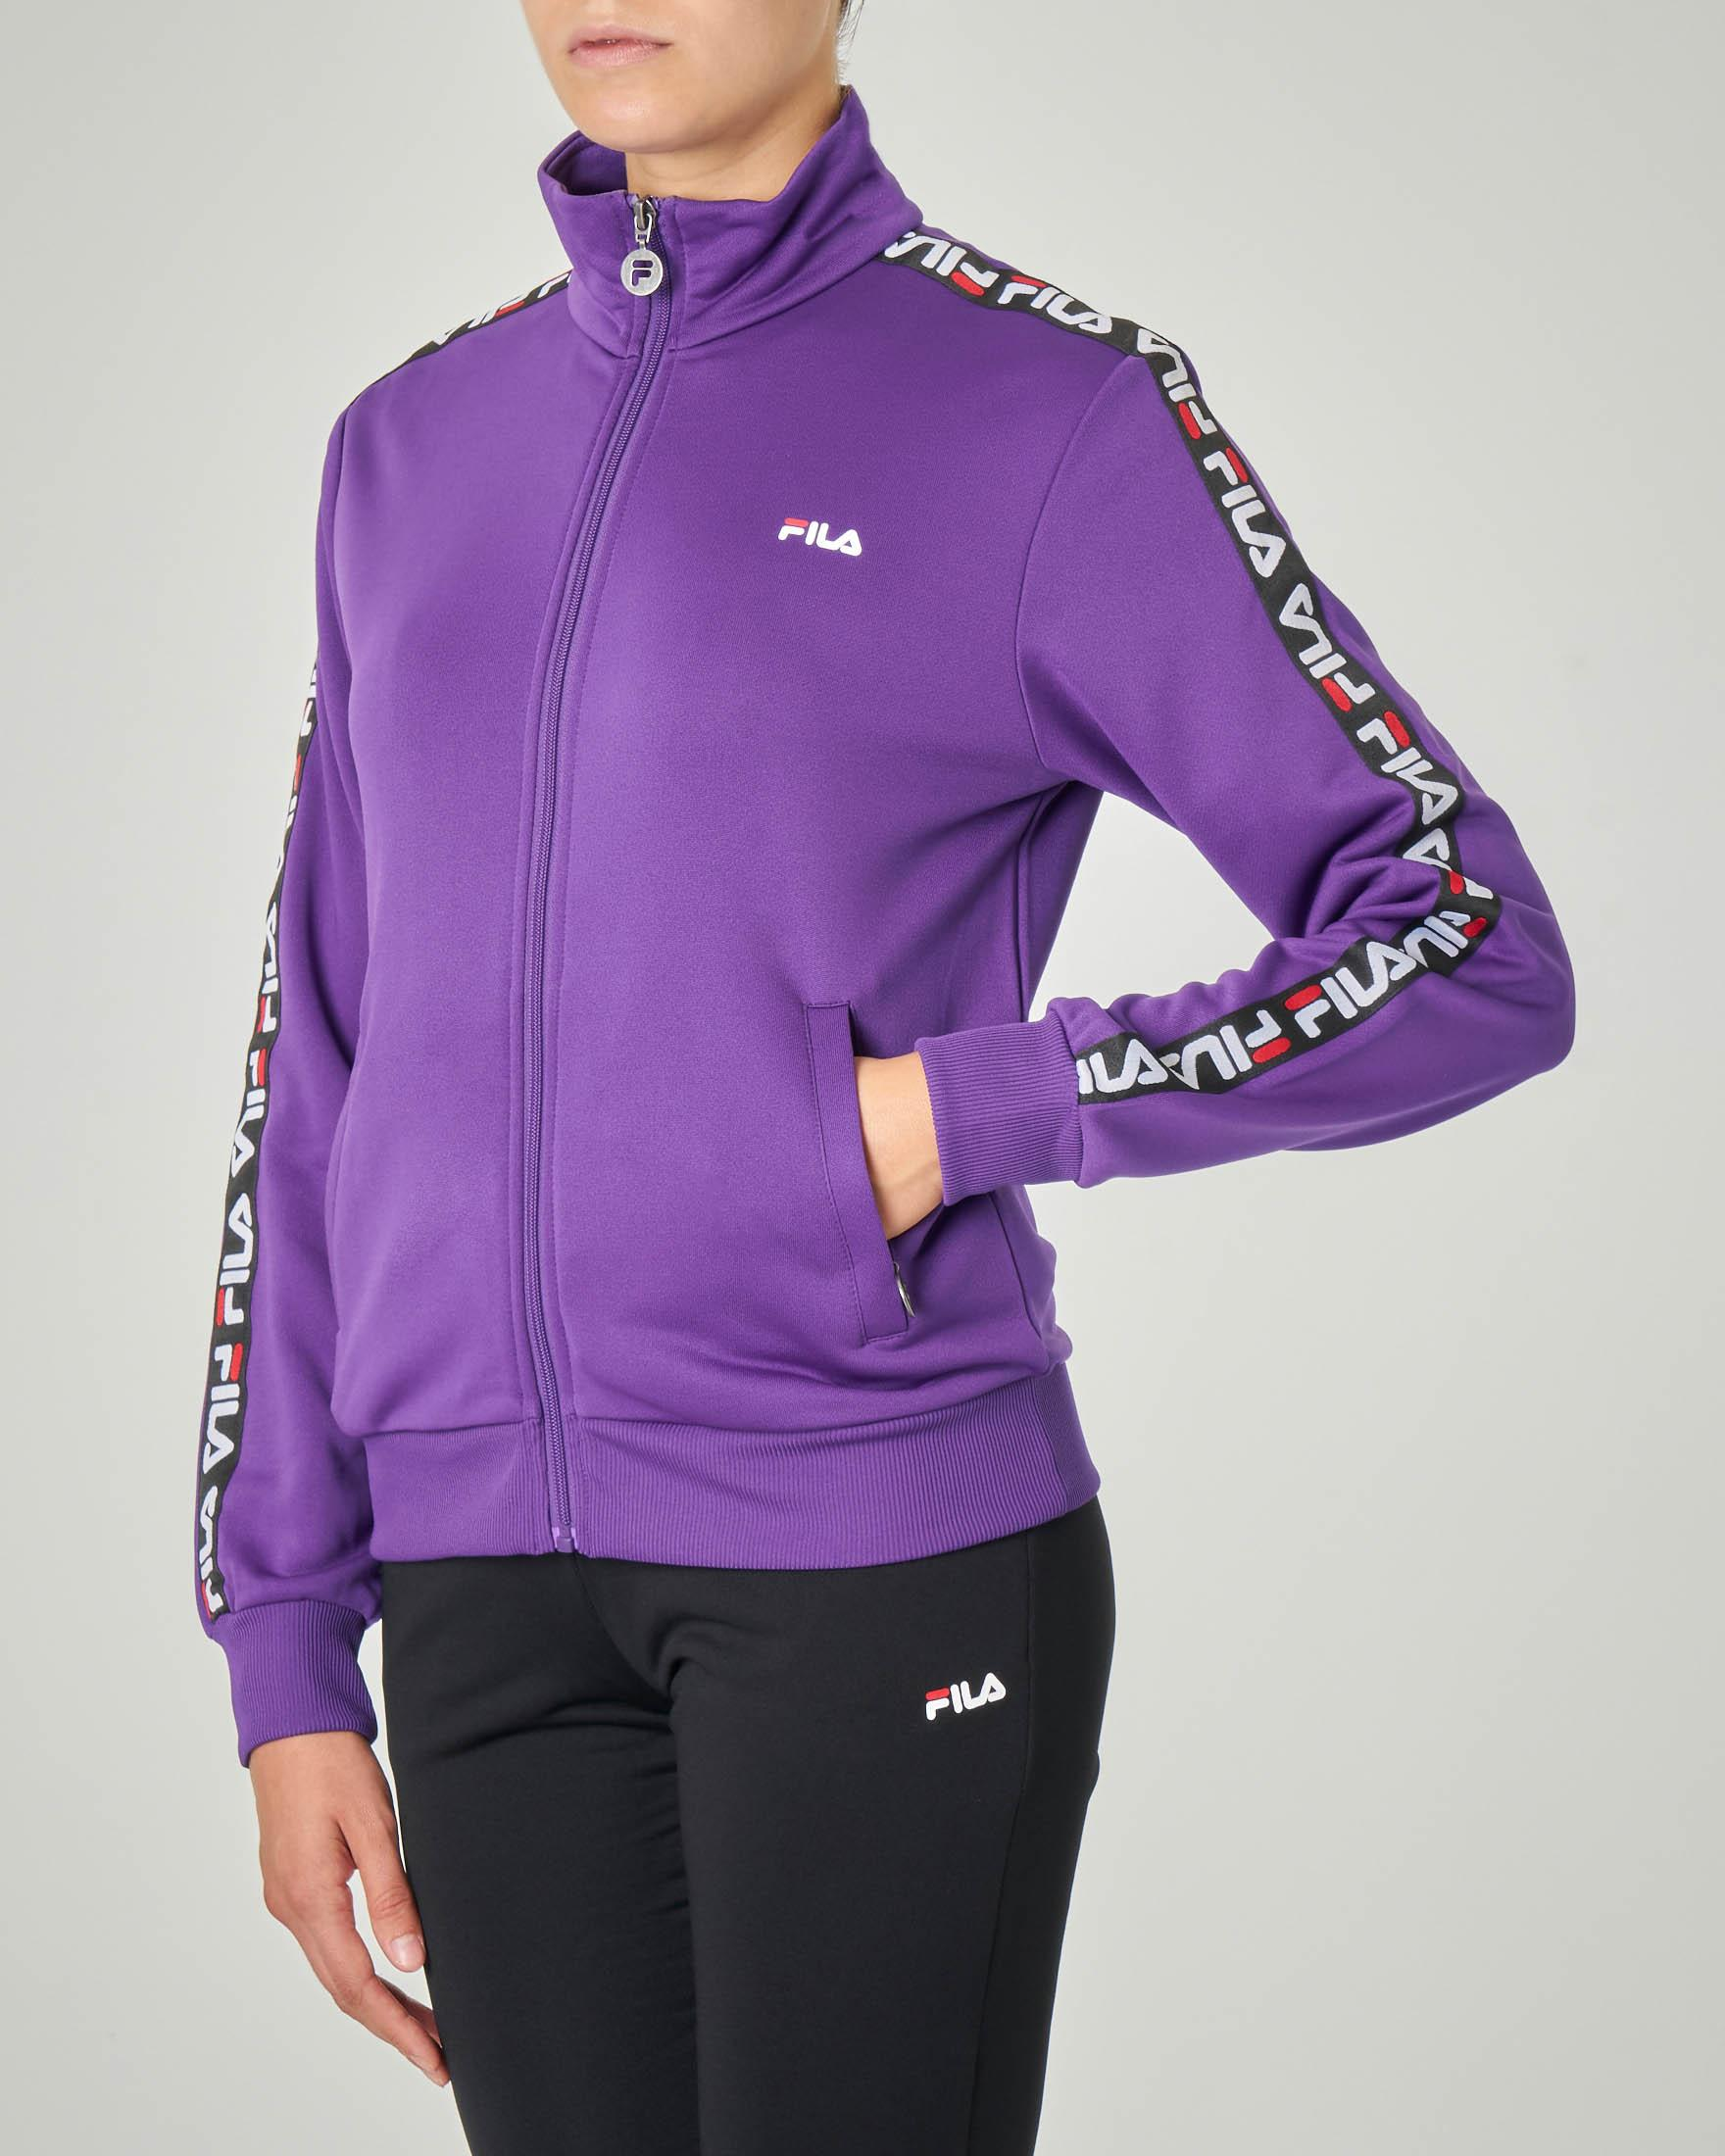 Felpa viola in tessuto acetato con chiusura a zip e bande laterali con scritta logo continua a contrasto